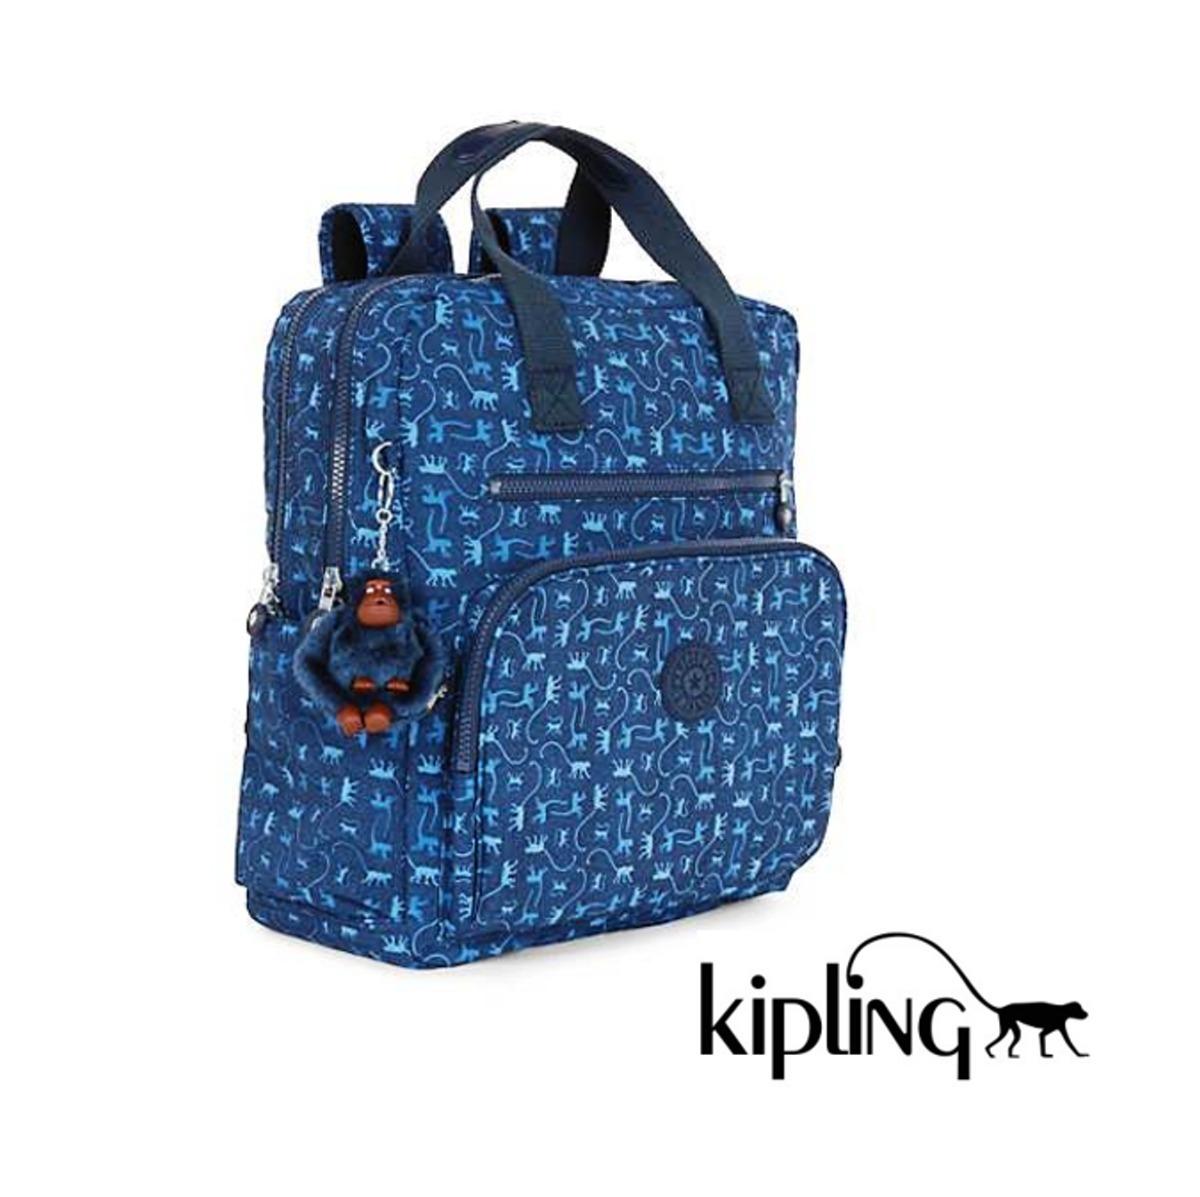 699 Bolsa Maternidade Kipling Monkey Mania Blue Audrie R Mochila kZiPuX